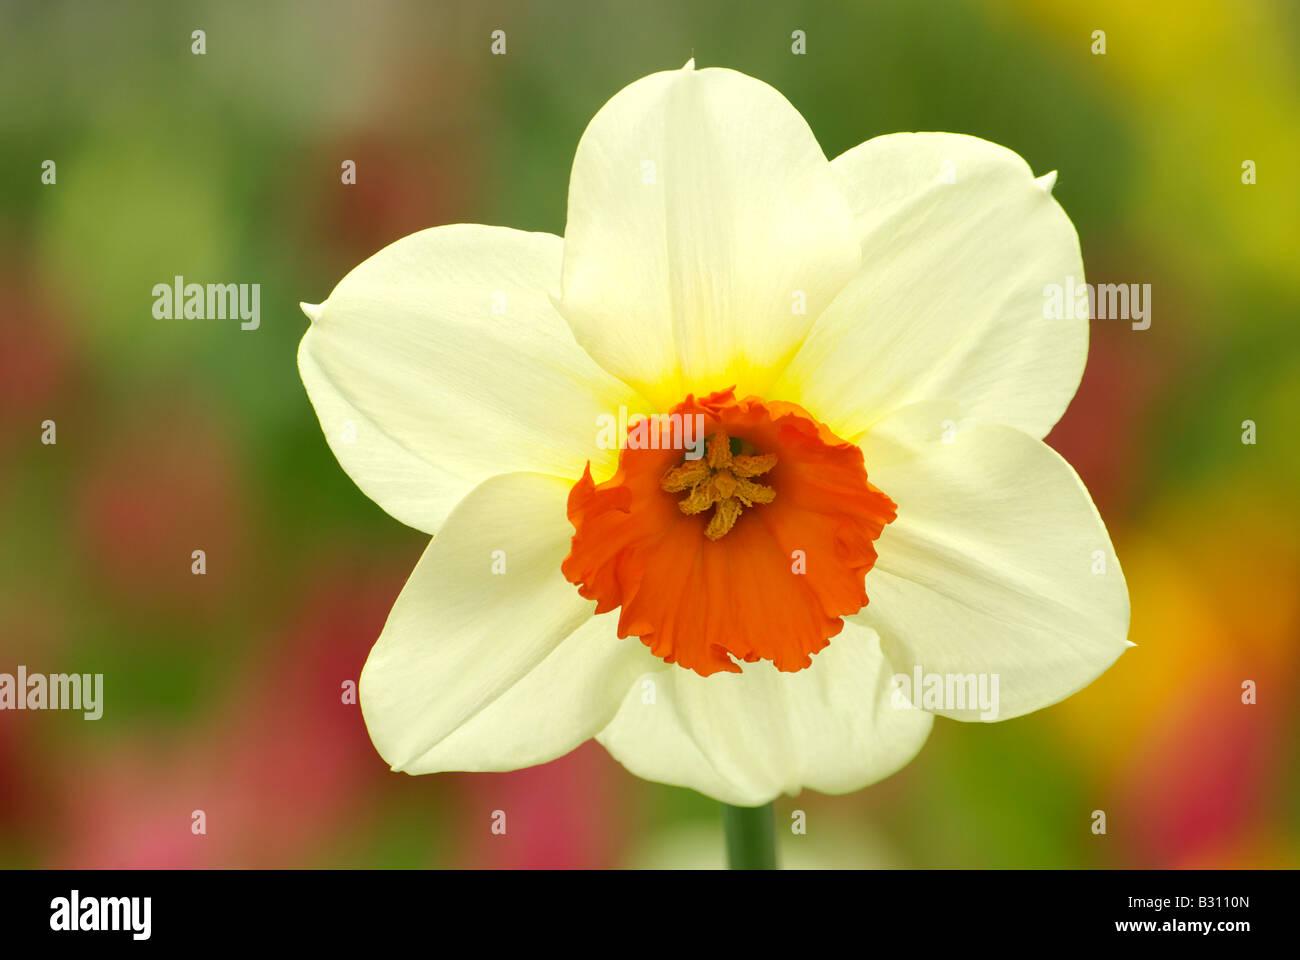 Narciso amor sola flor Imagen De Stock